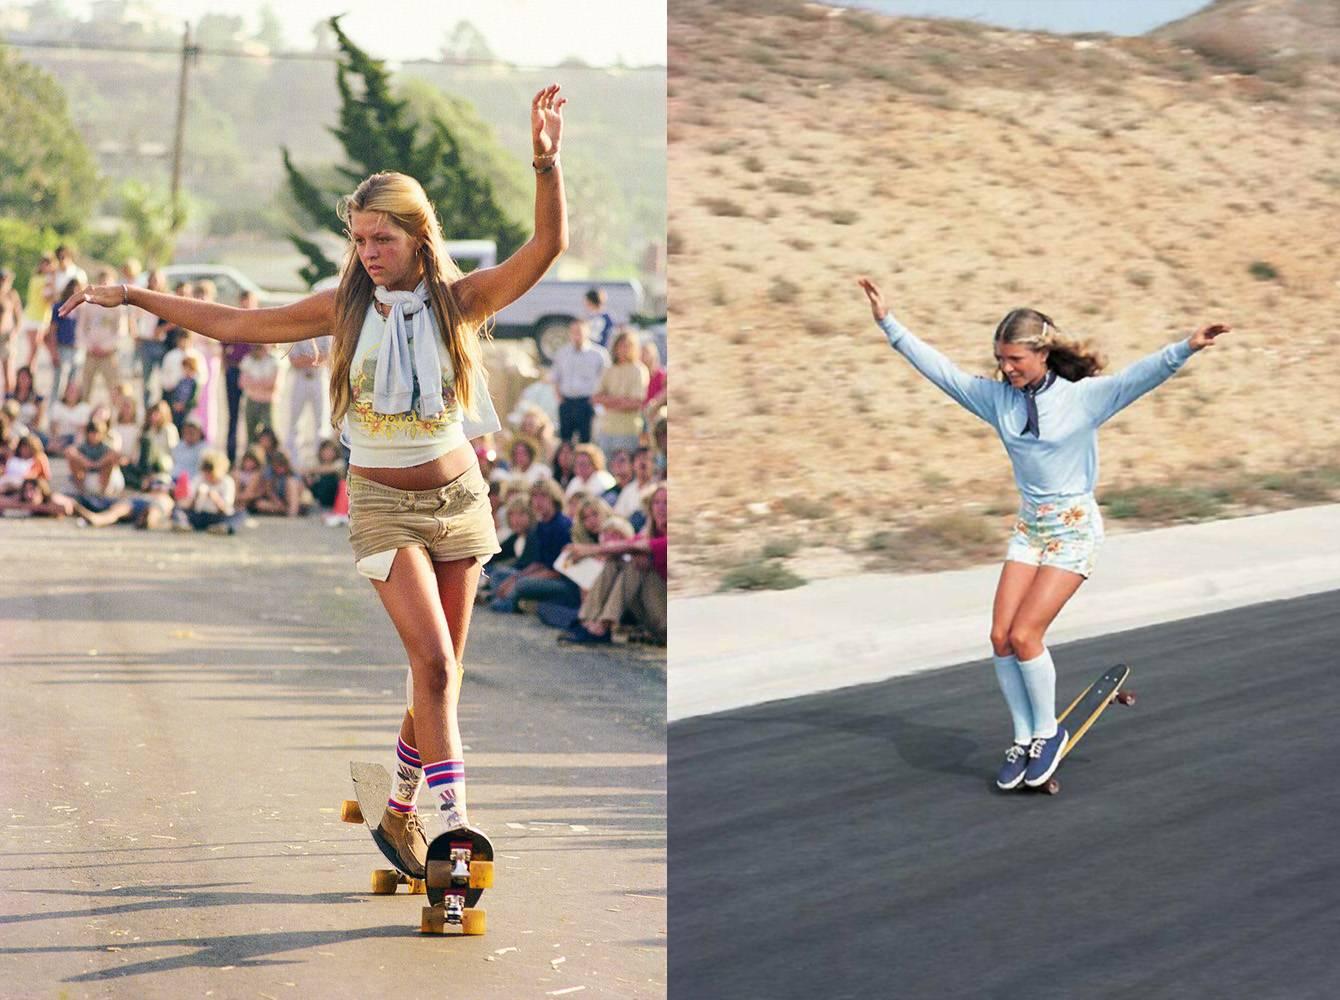 sobre-ruedas-long-days-longboard-dancing-ellen-oneal-skateboarding-freestyle-sidewalks-dogtown-surf-oldschool-skateboard-girl-01-hugh-holland